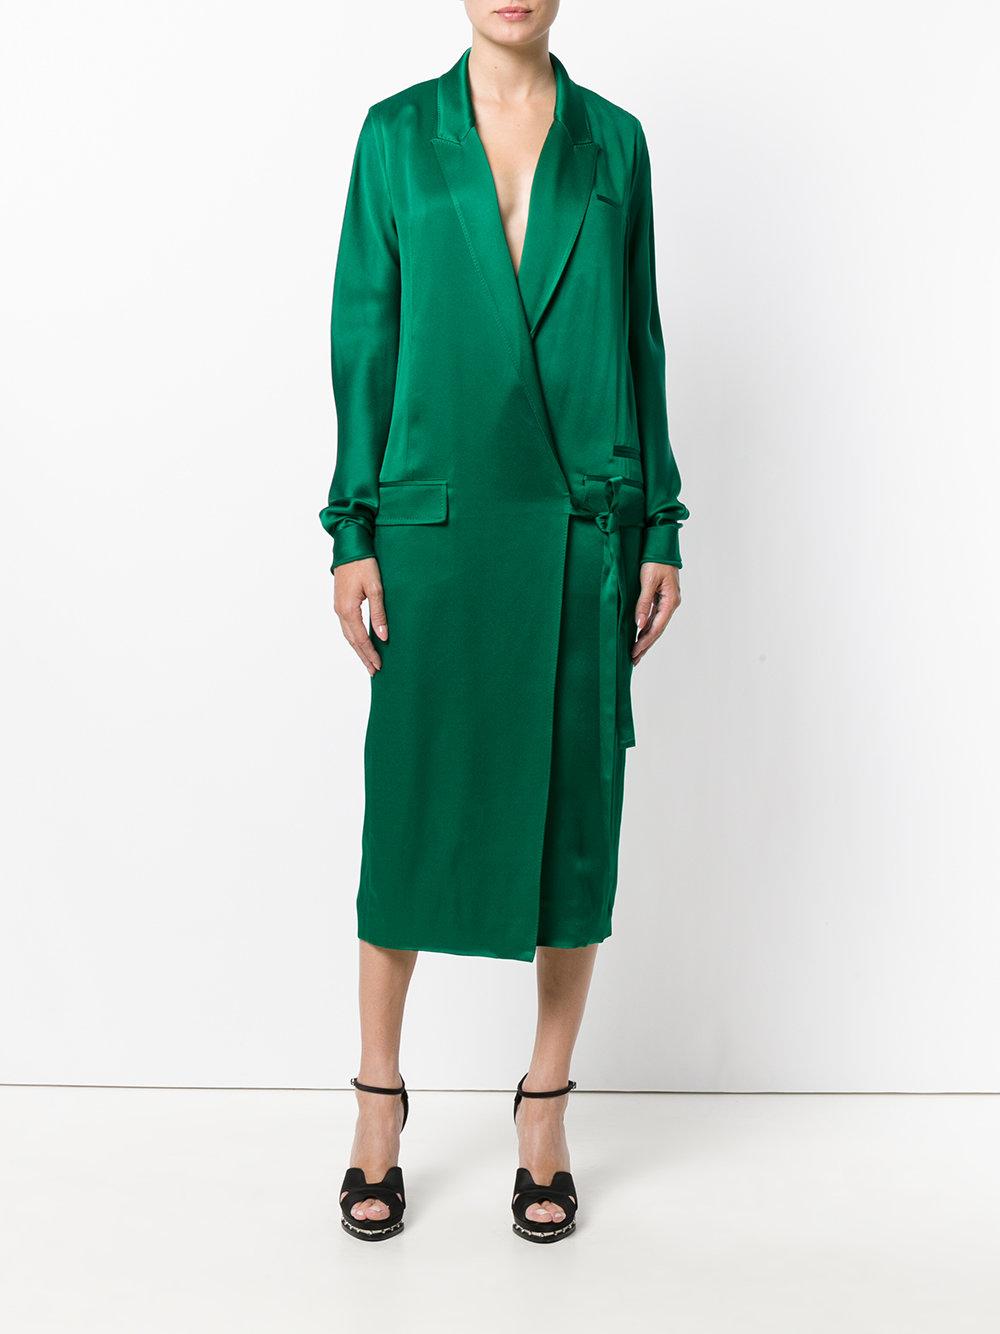 HAIDER ACKERMANN платье с запахом на одну сторону 72 995 ₽ | 30% скидка 51 097 ₽